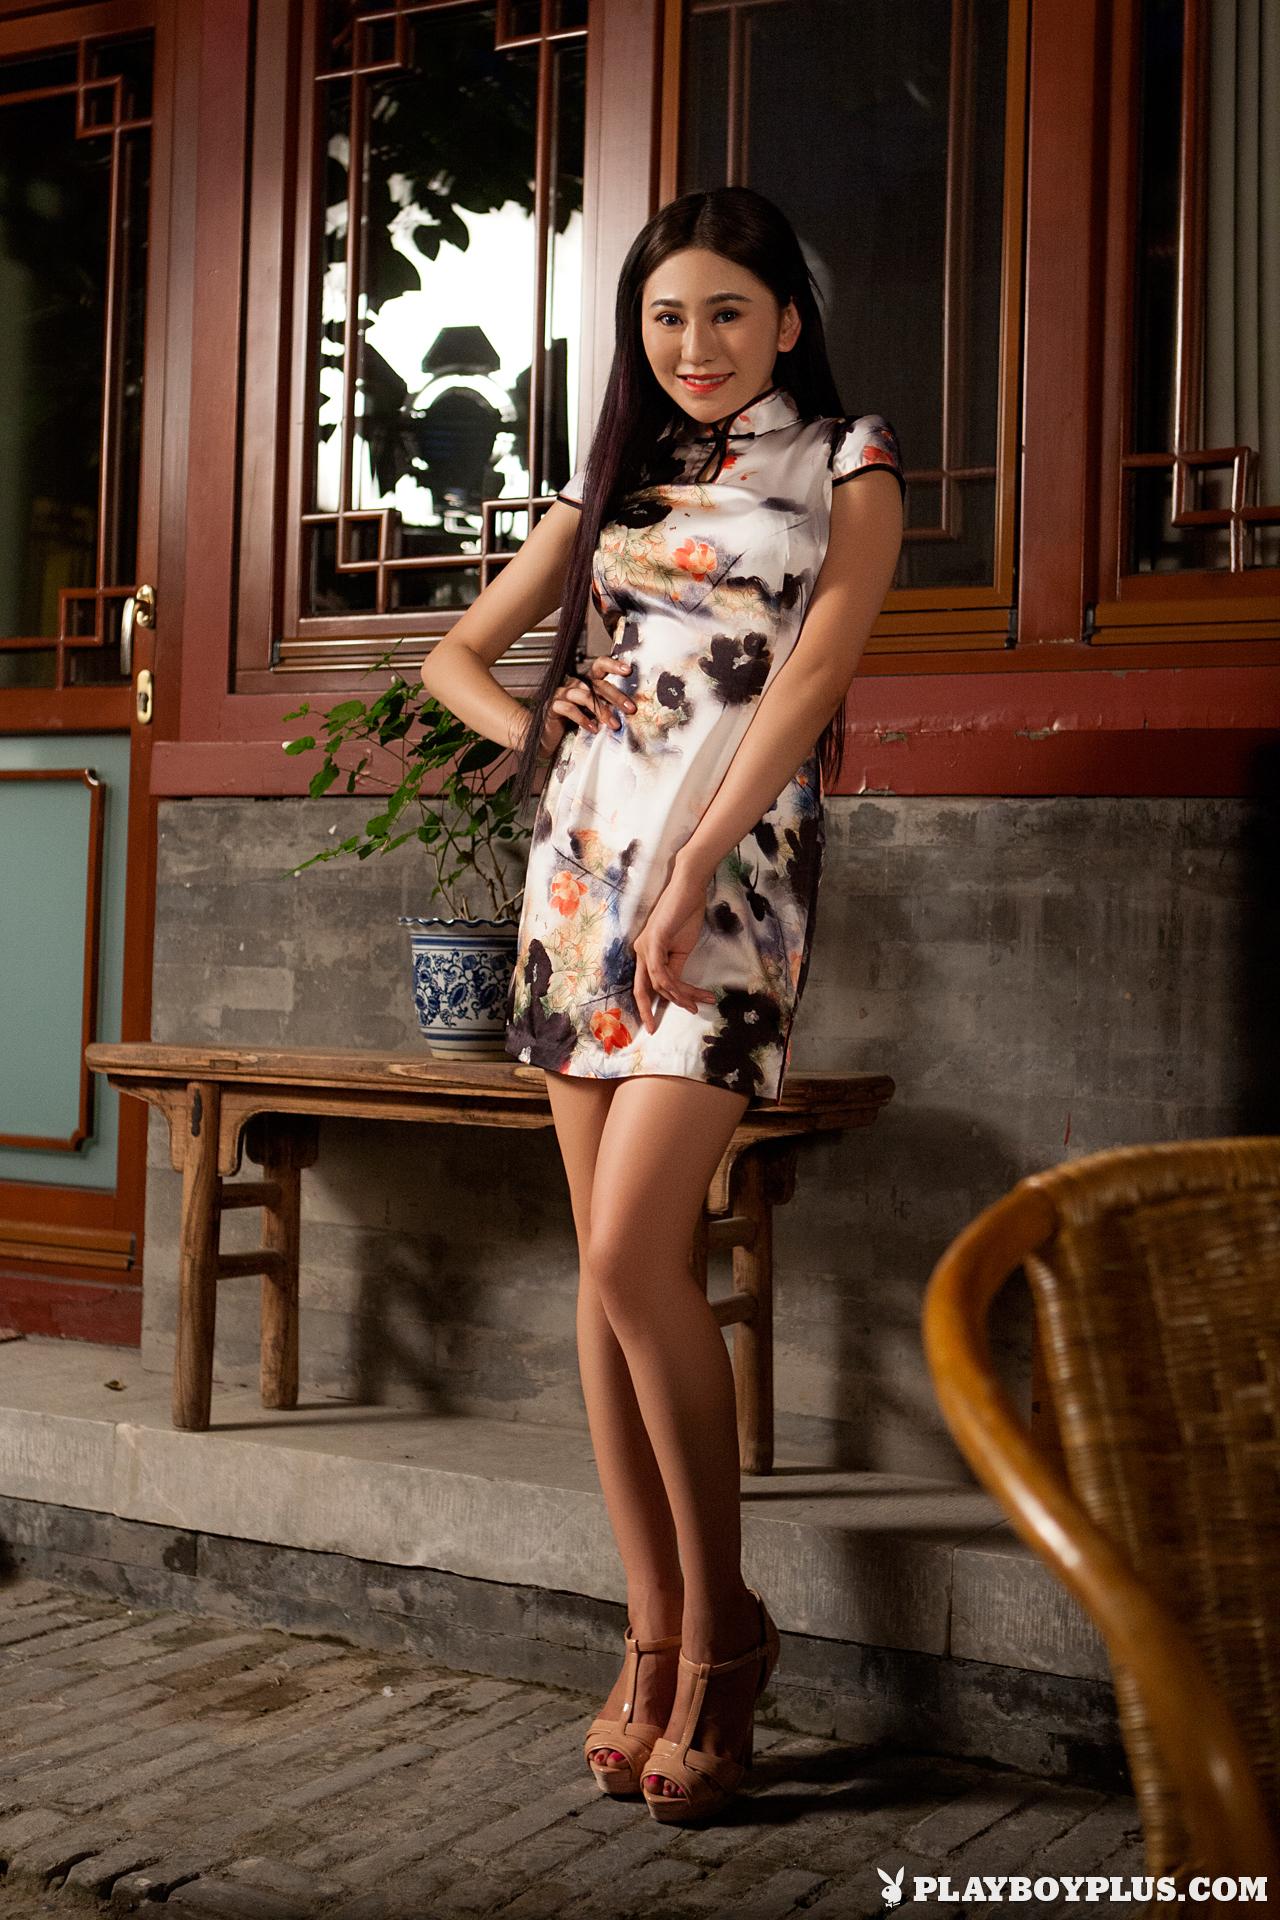 wu-muxi-nude-chinese-girl-short-dress-playboy-06